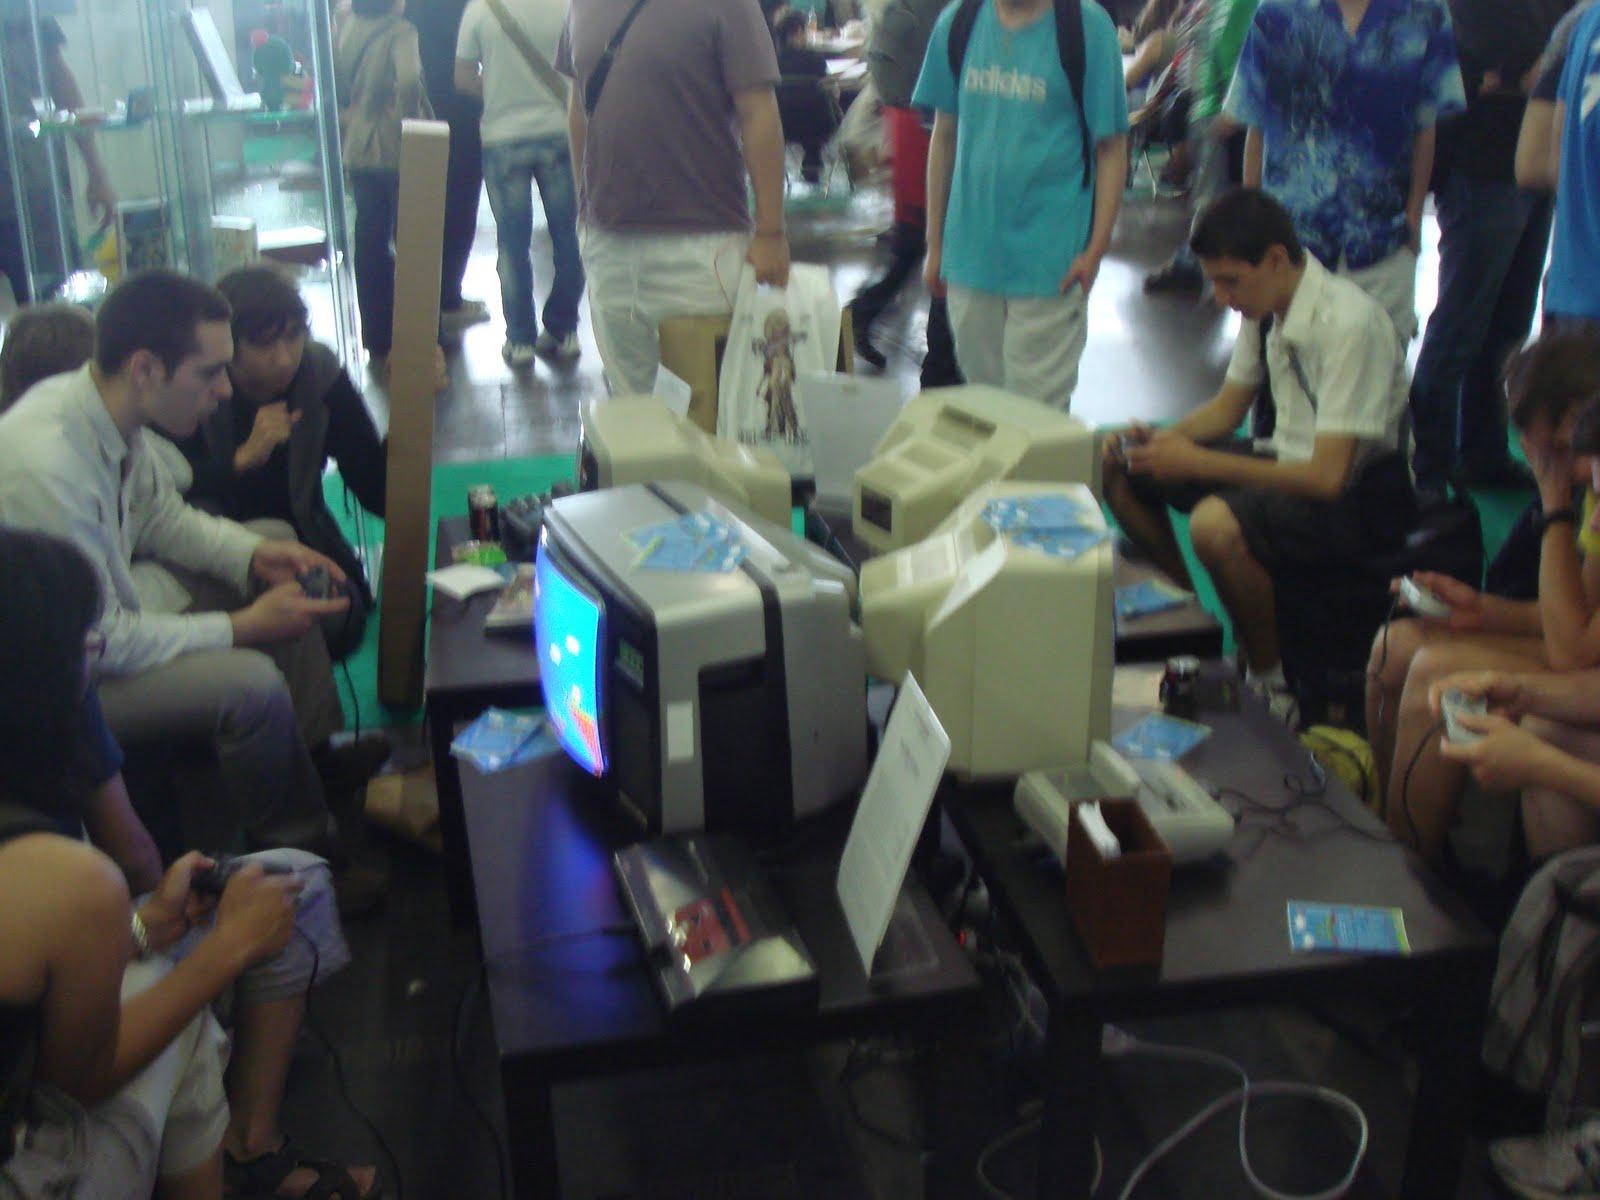 tienda videojuegos barcelona